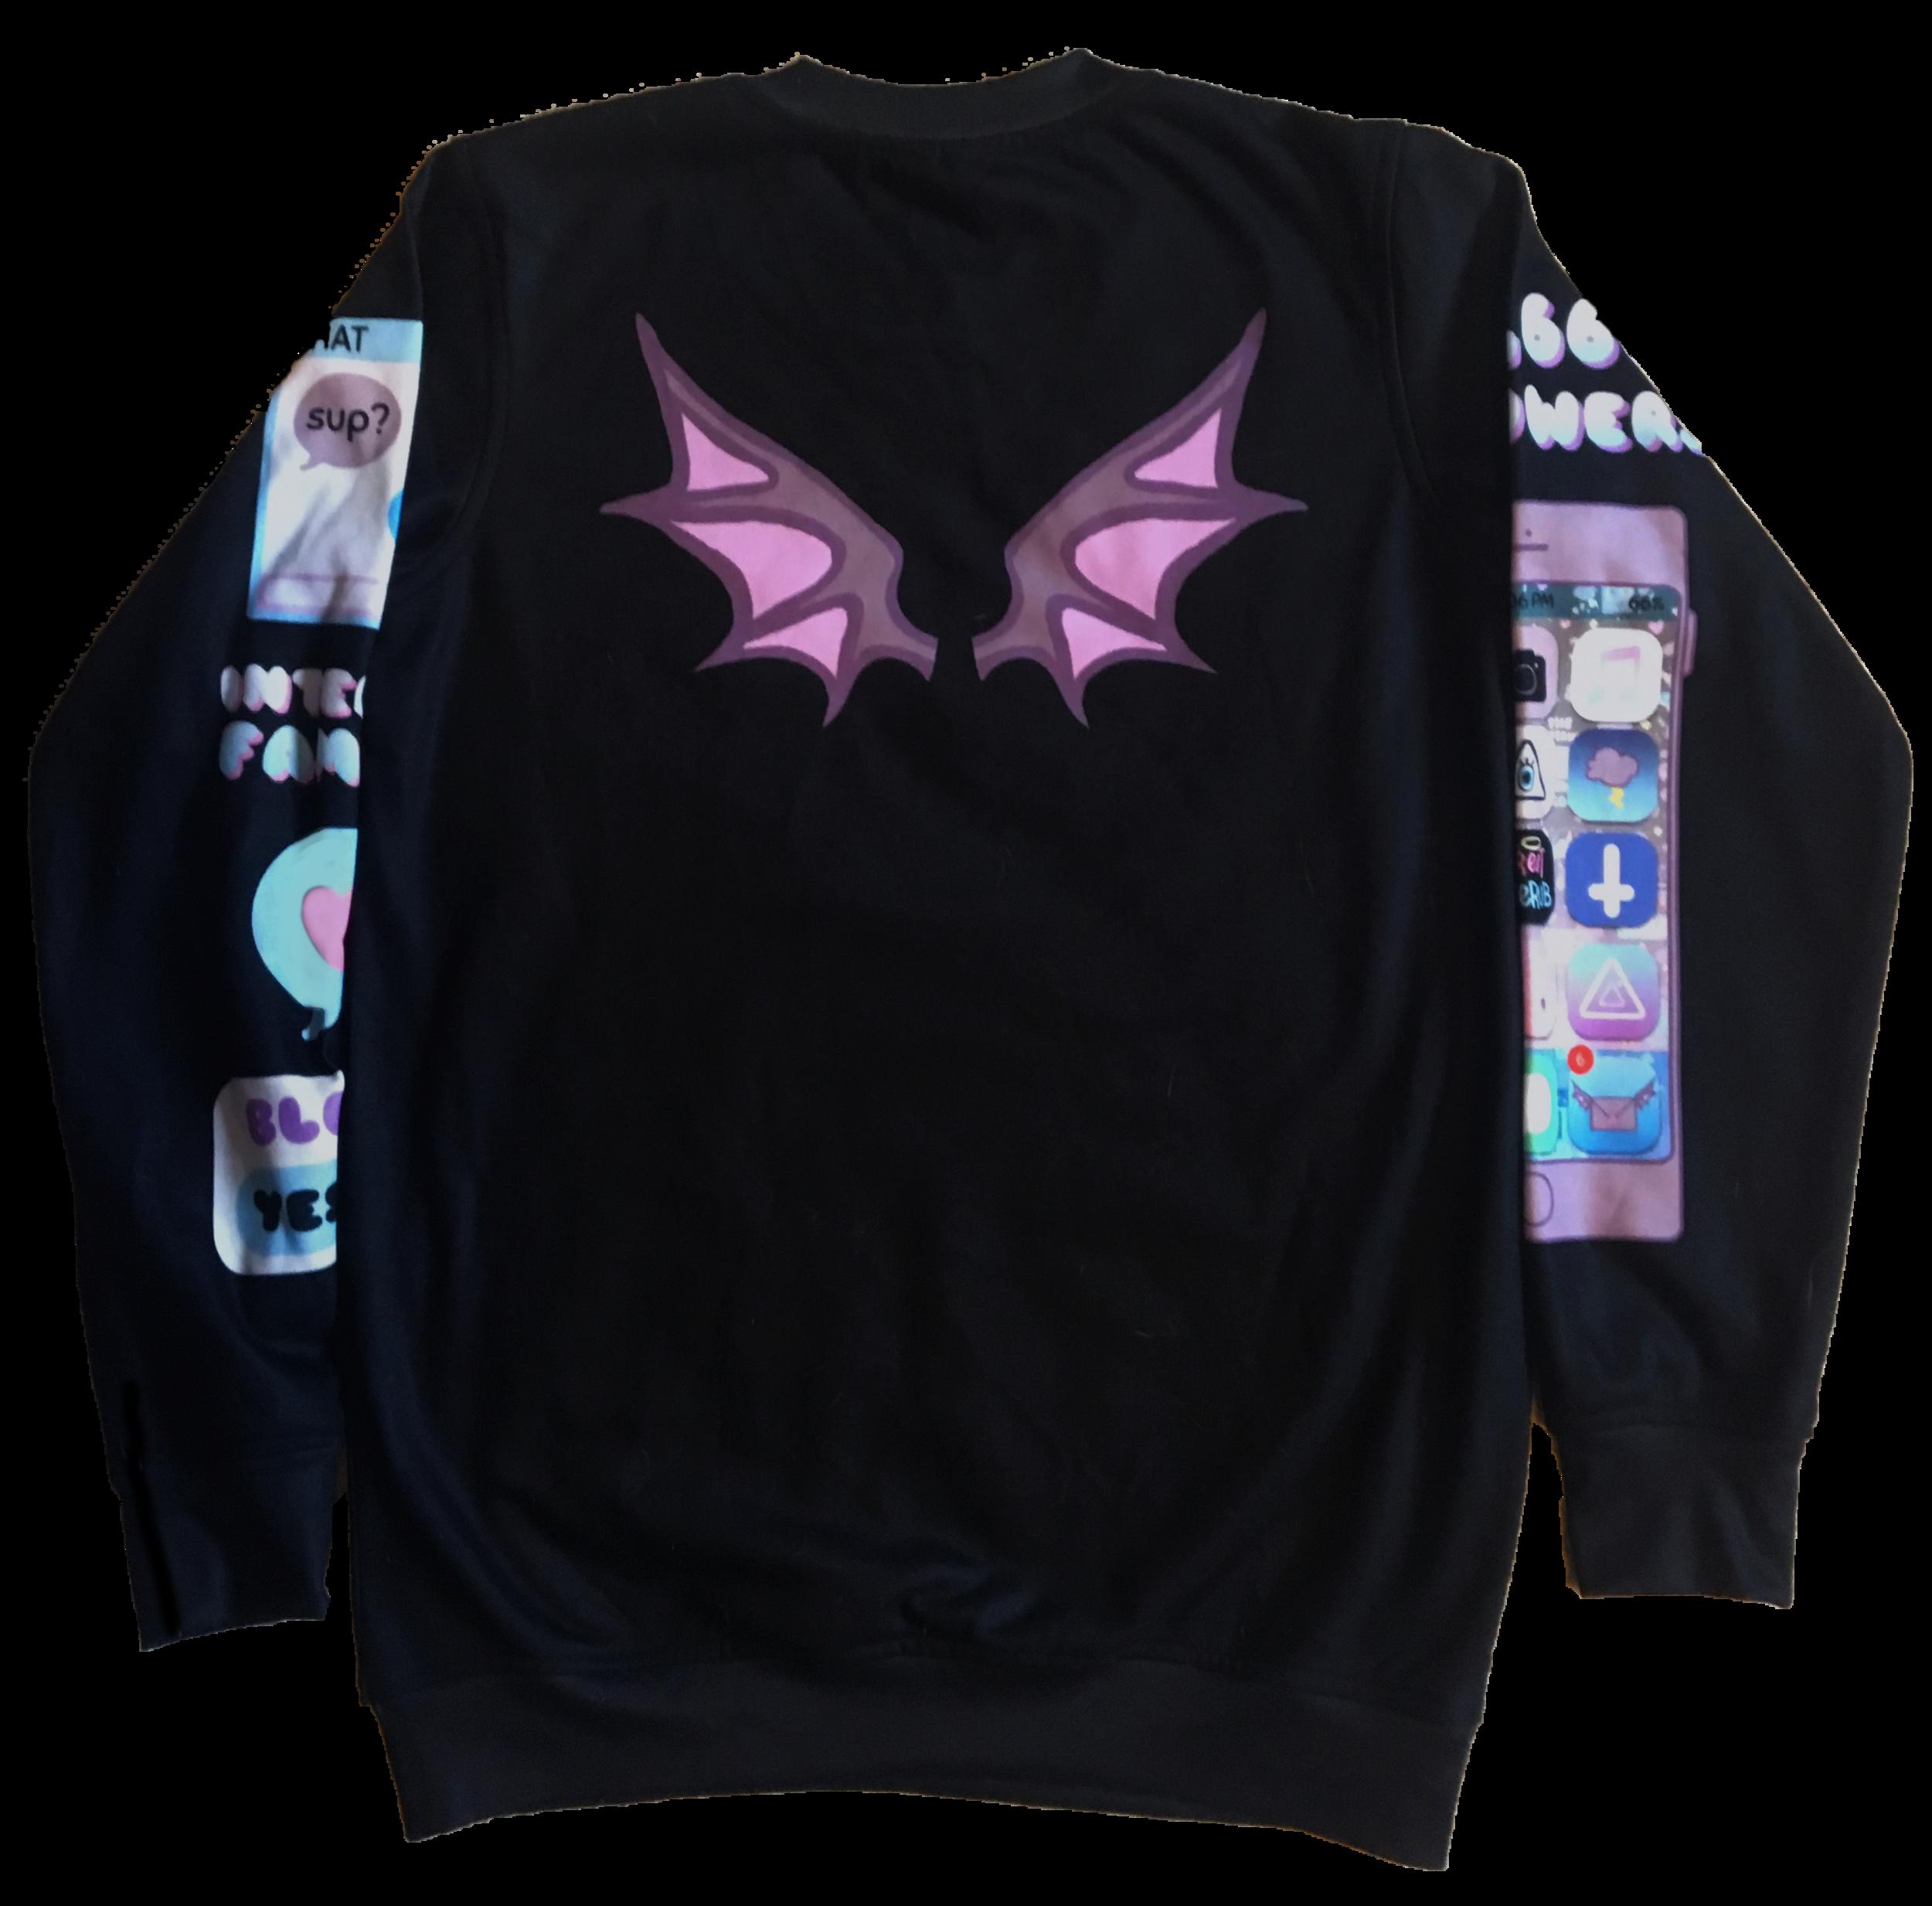 mori sweater back transp bg.png